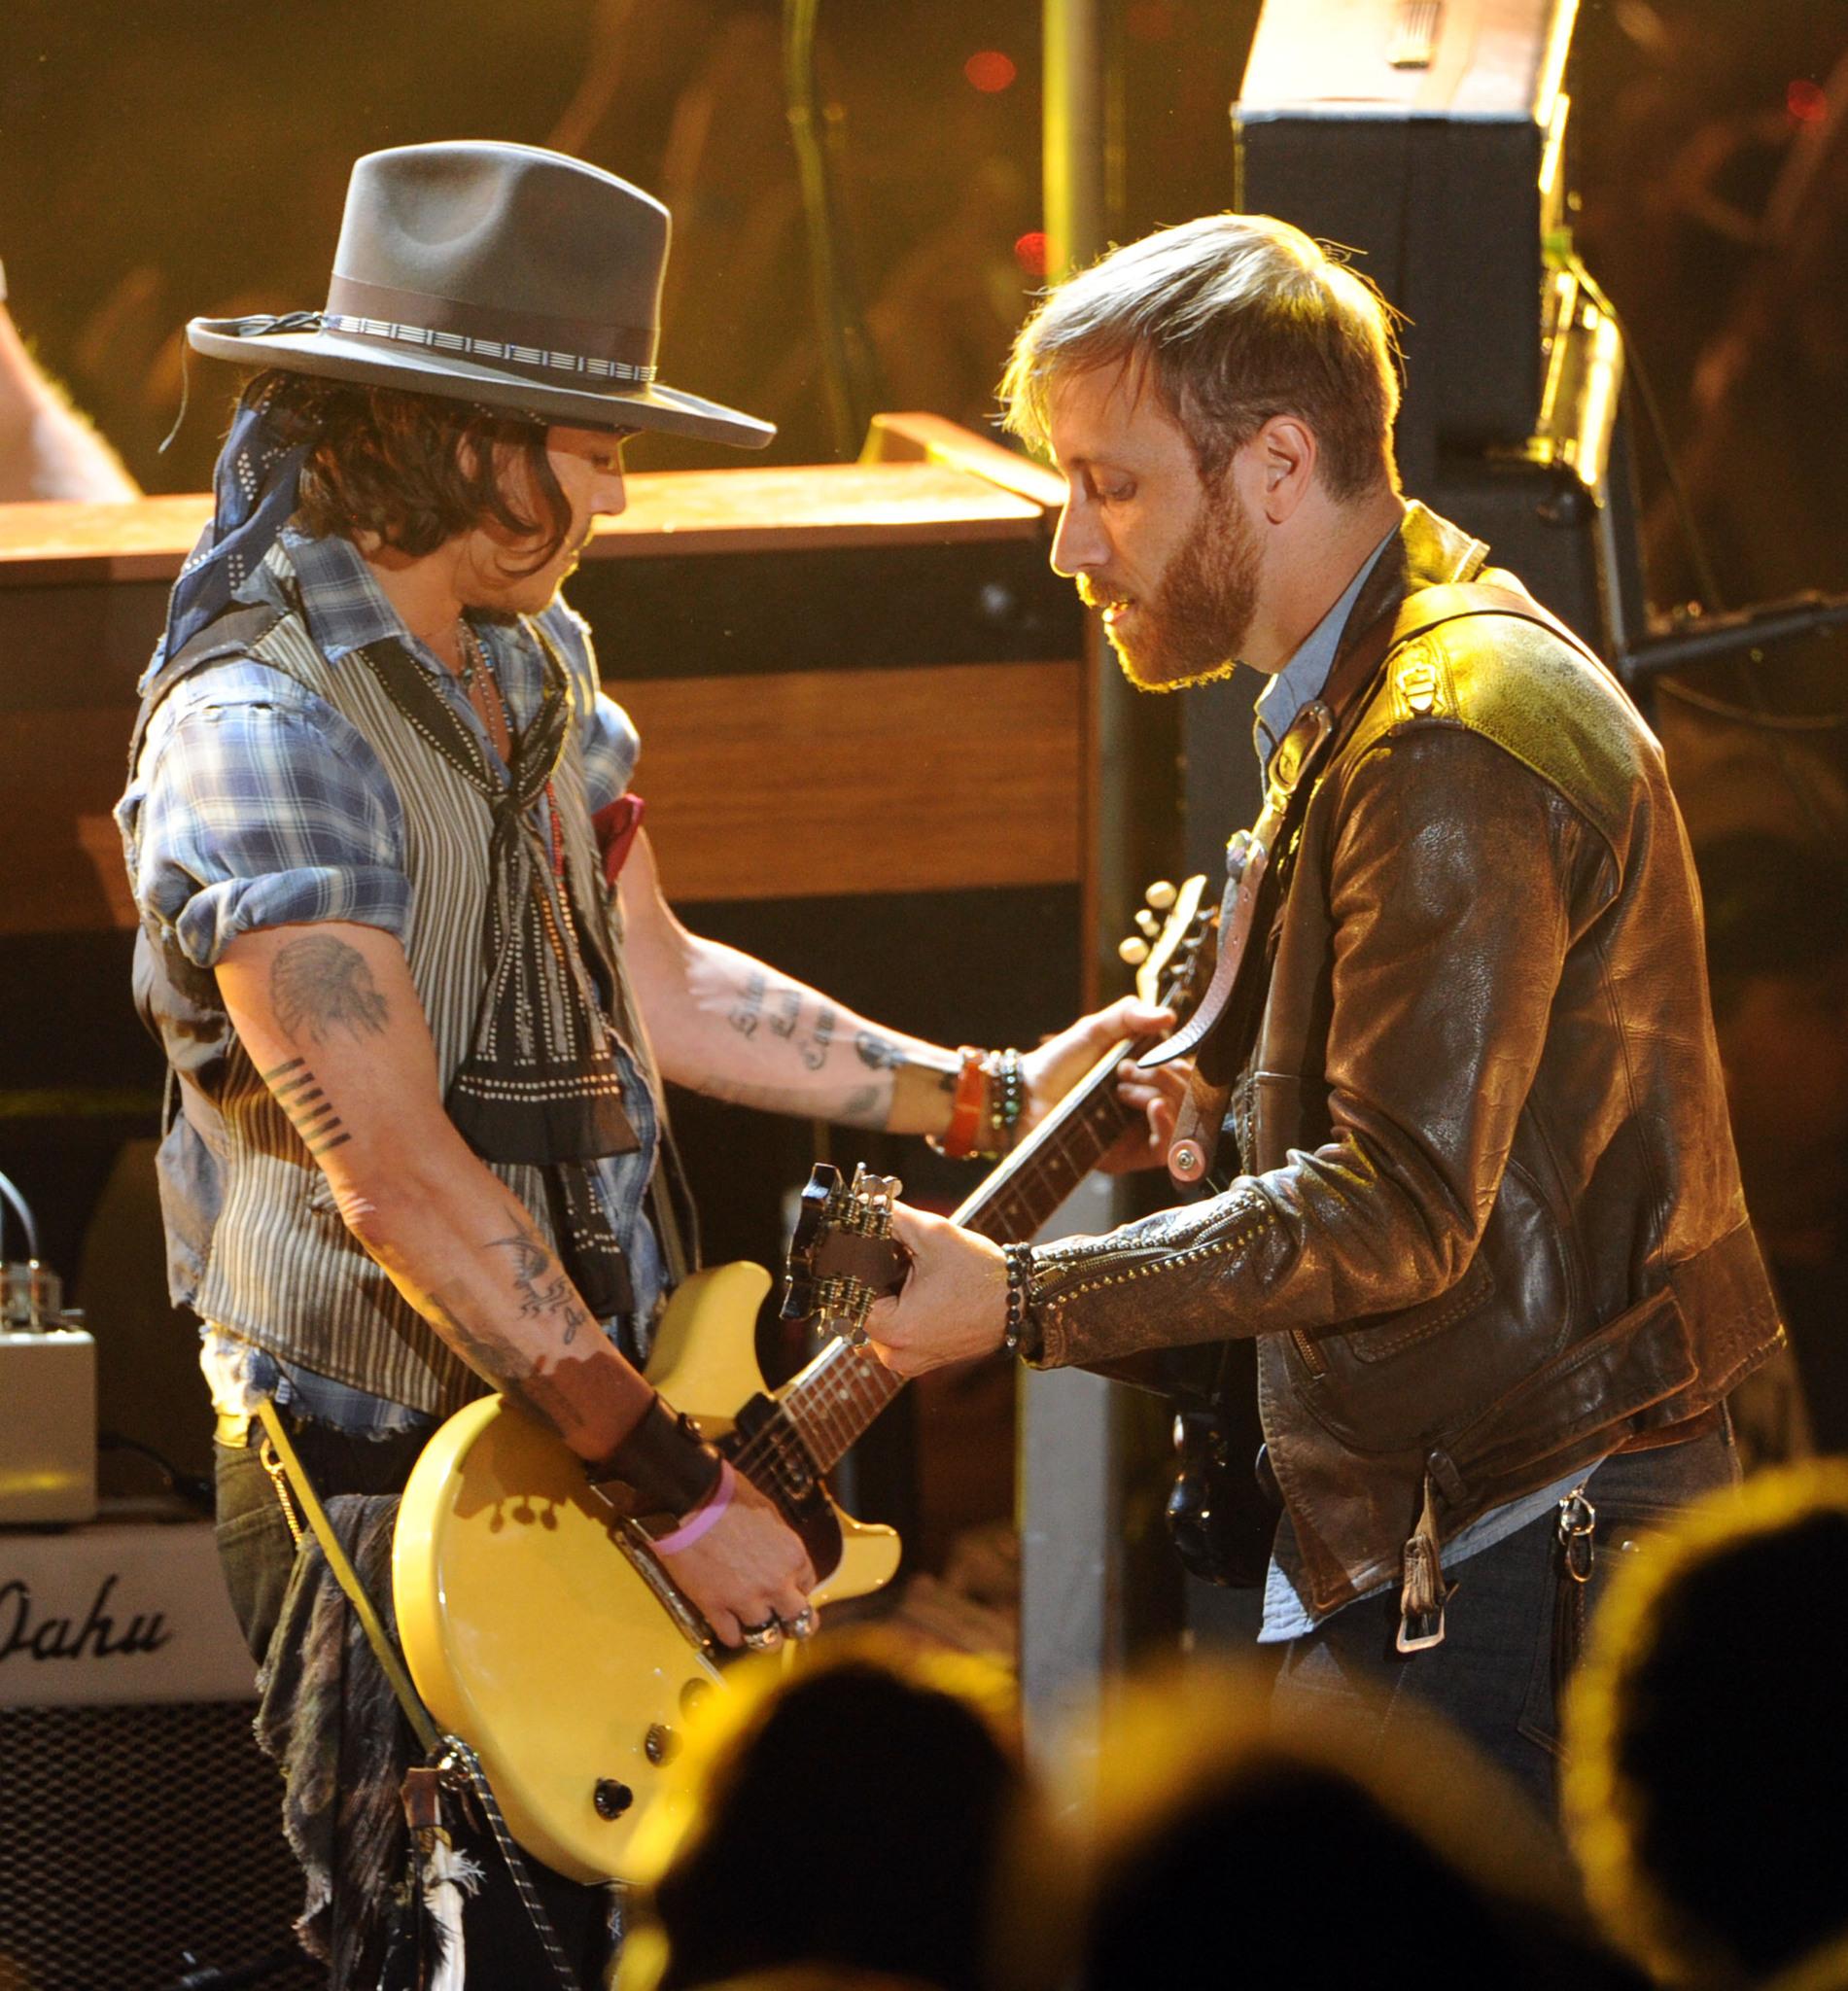 Johnny Depp, Dan Auerbach and The Black Keys at event of 2012 MTV Movie Awards (2012)